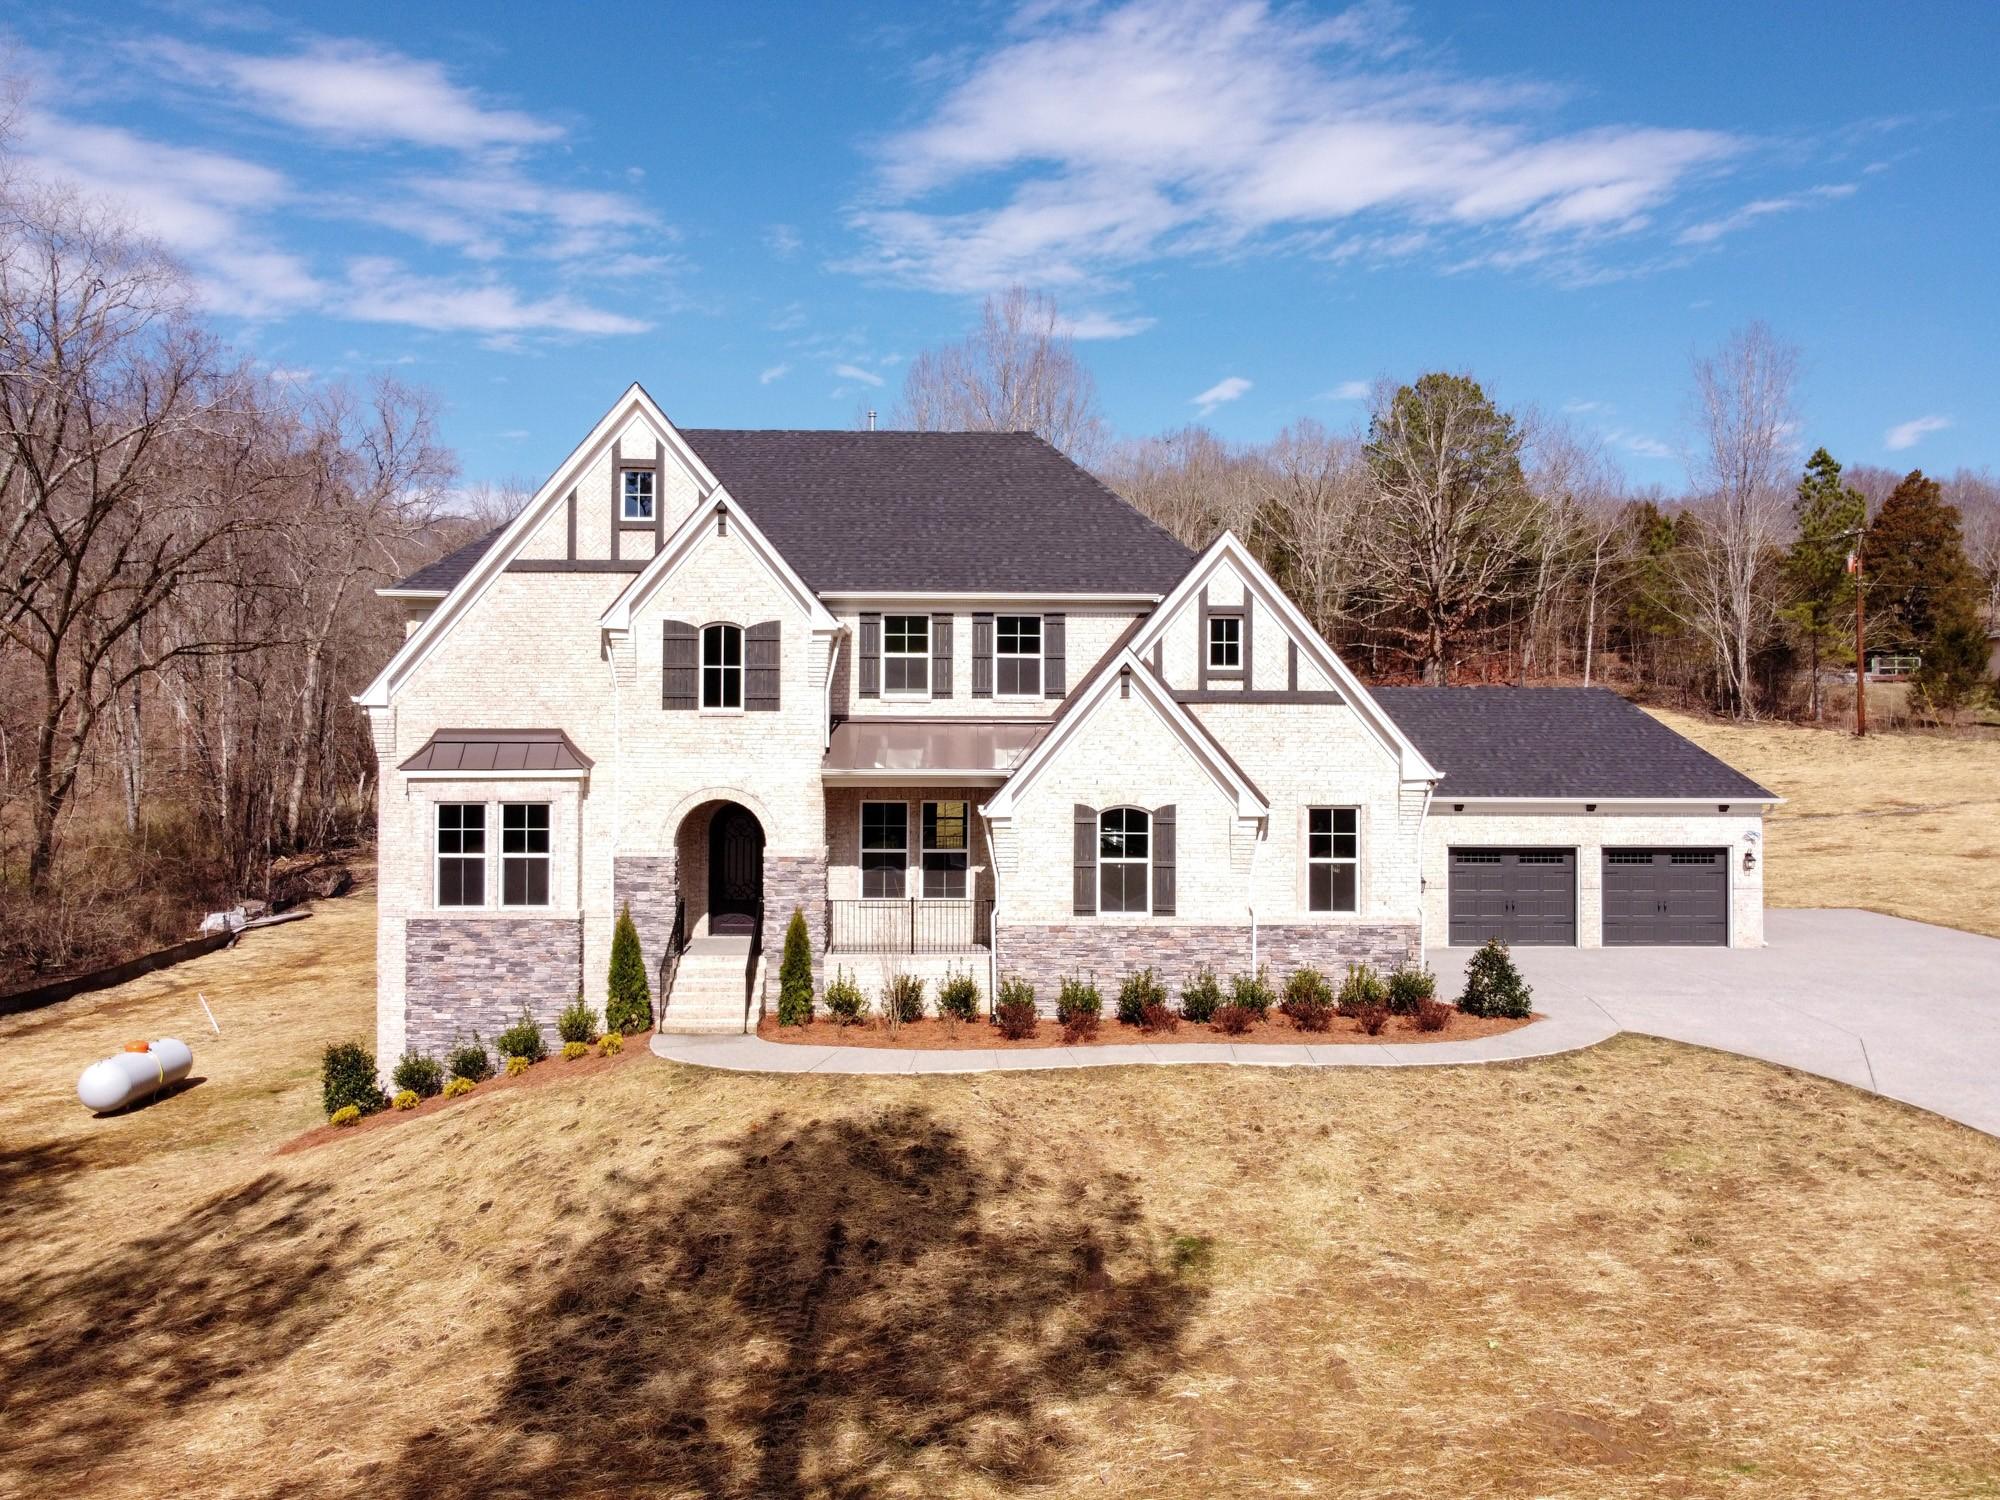 8170 Charlotte Pike Property Photo - Nashville, TN real estate listing